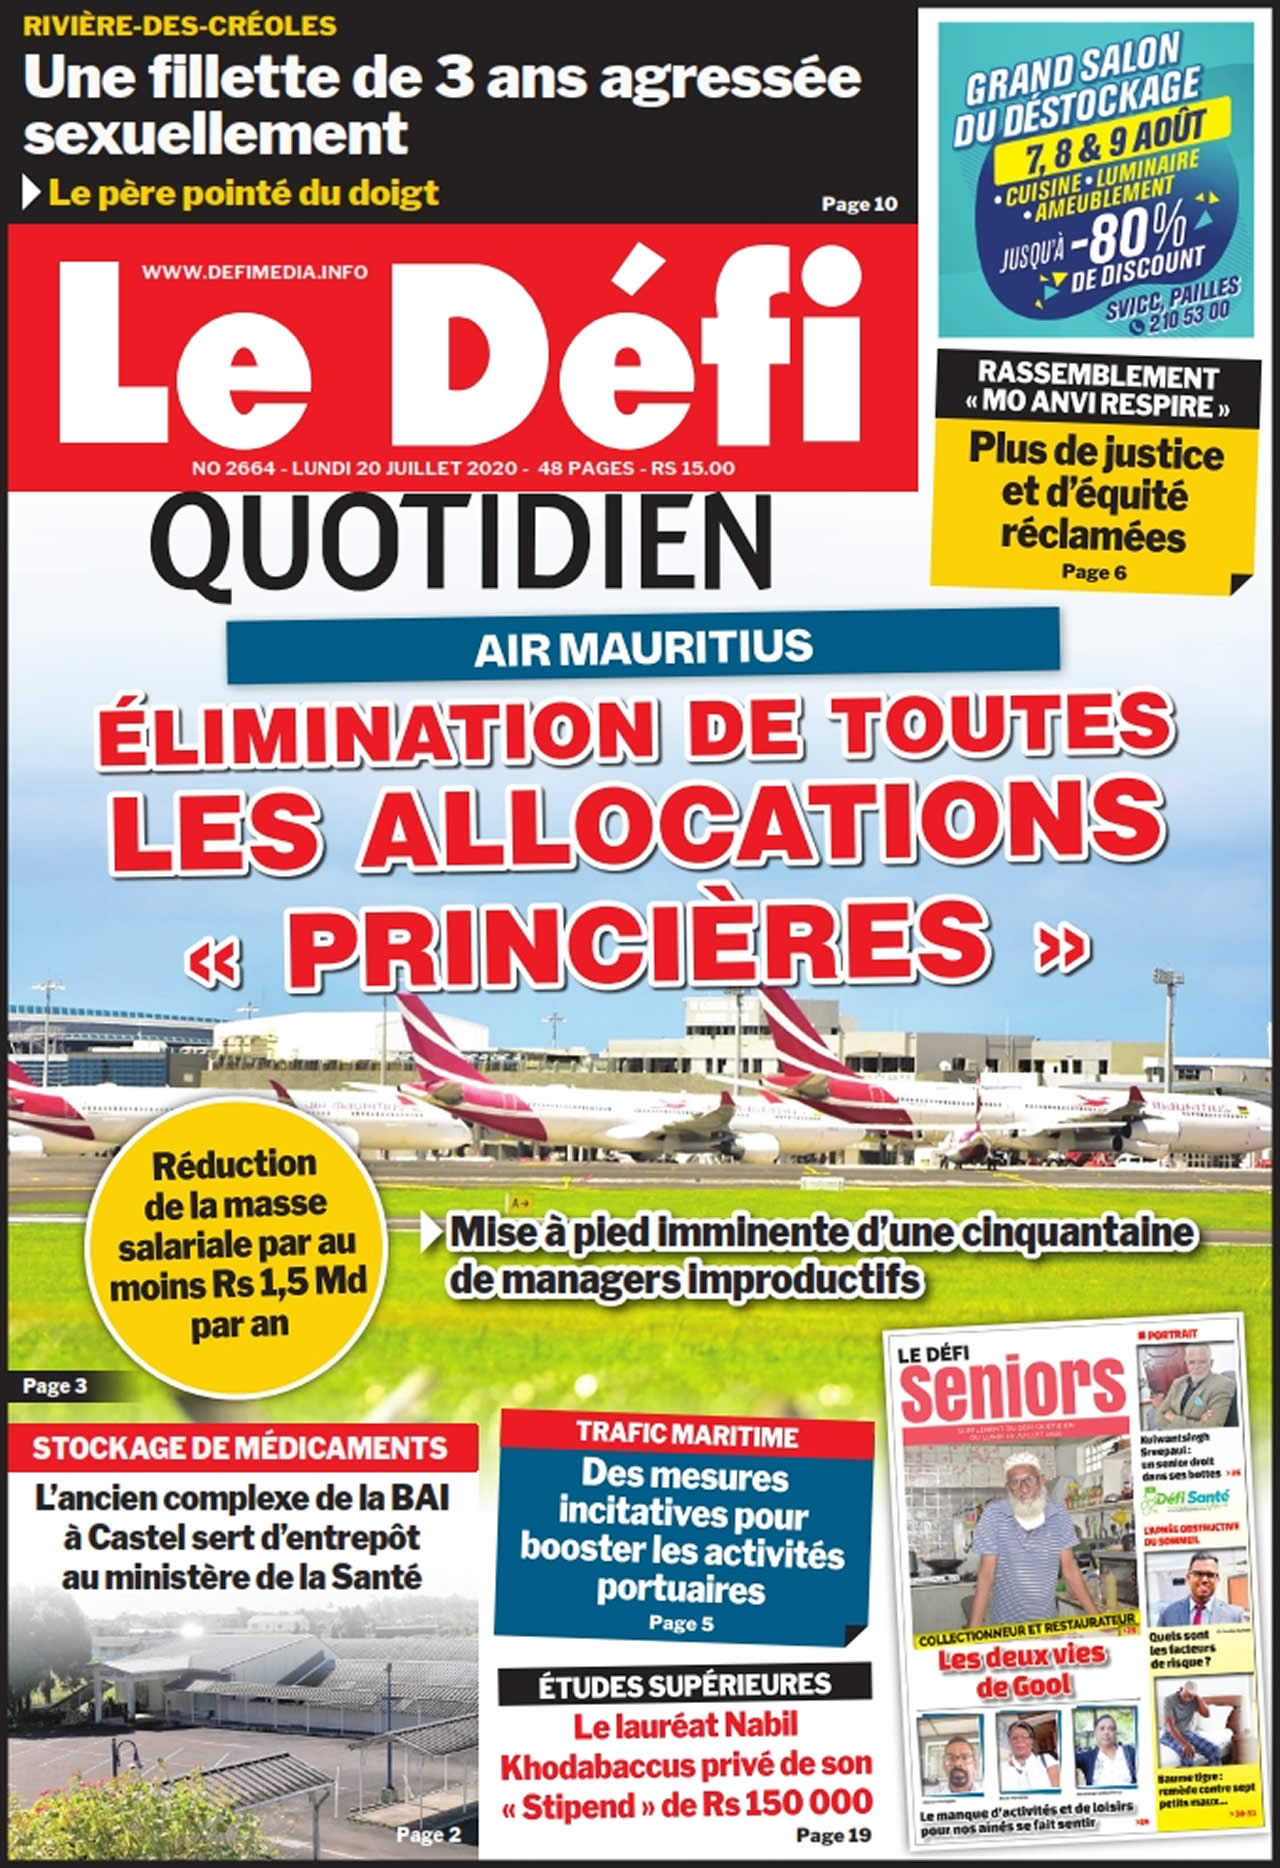 Quotidien 2664